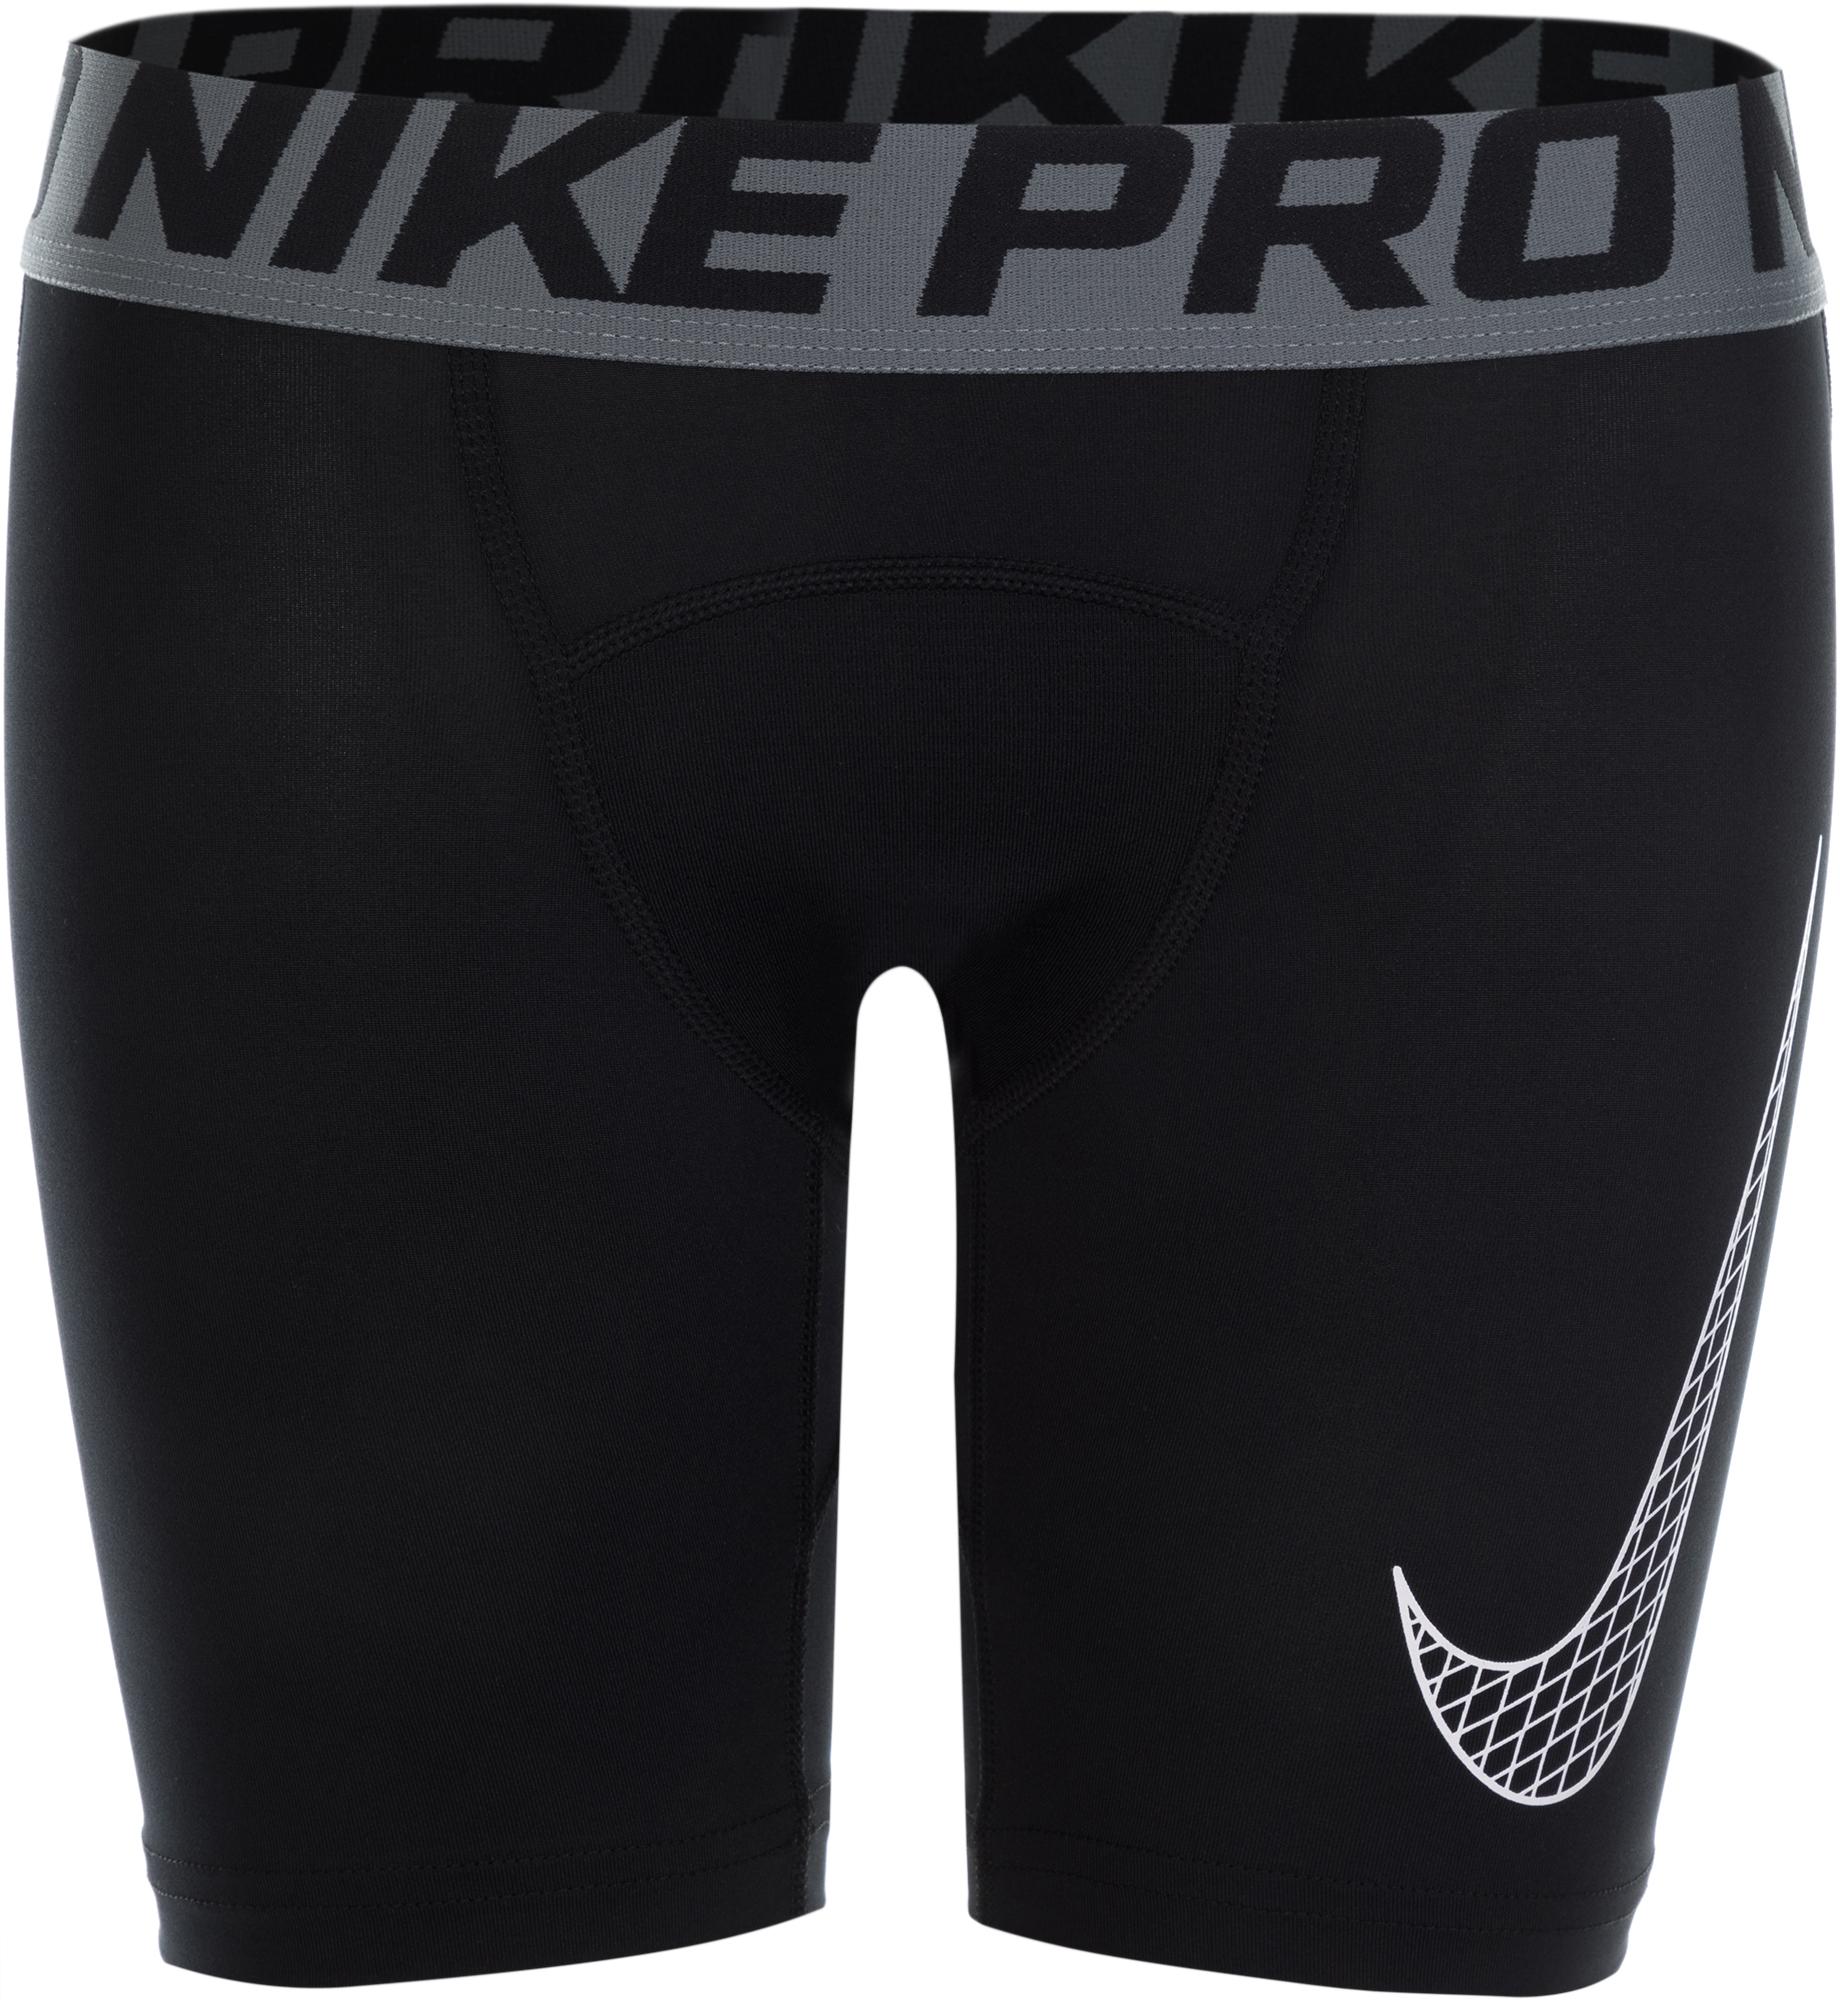 все цены на Nike Шорты для мальчиков Nike Pro, размер 158-170